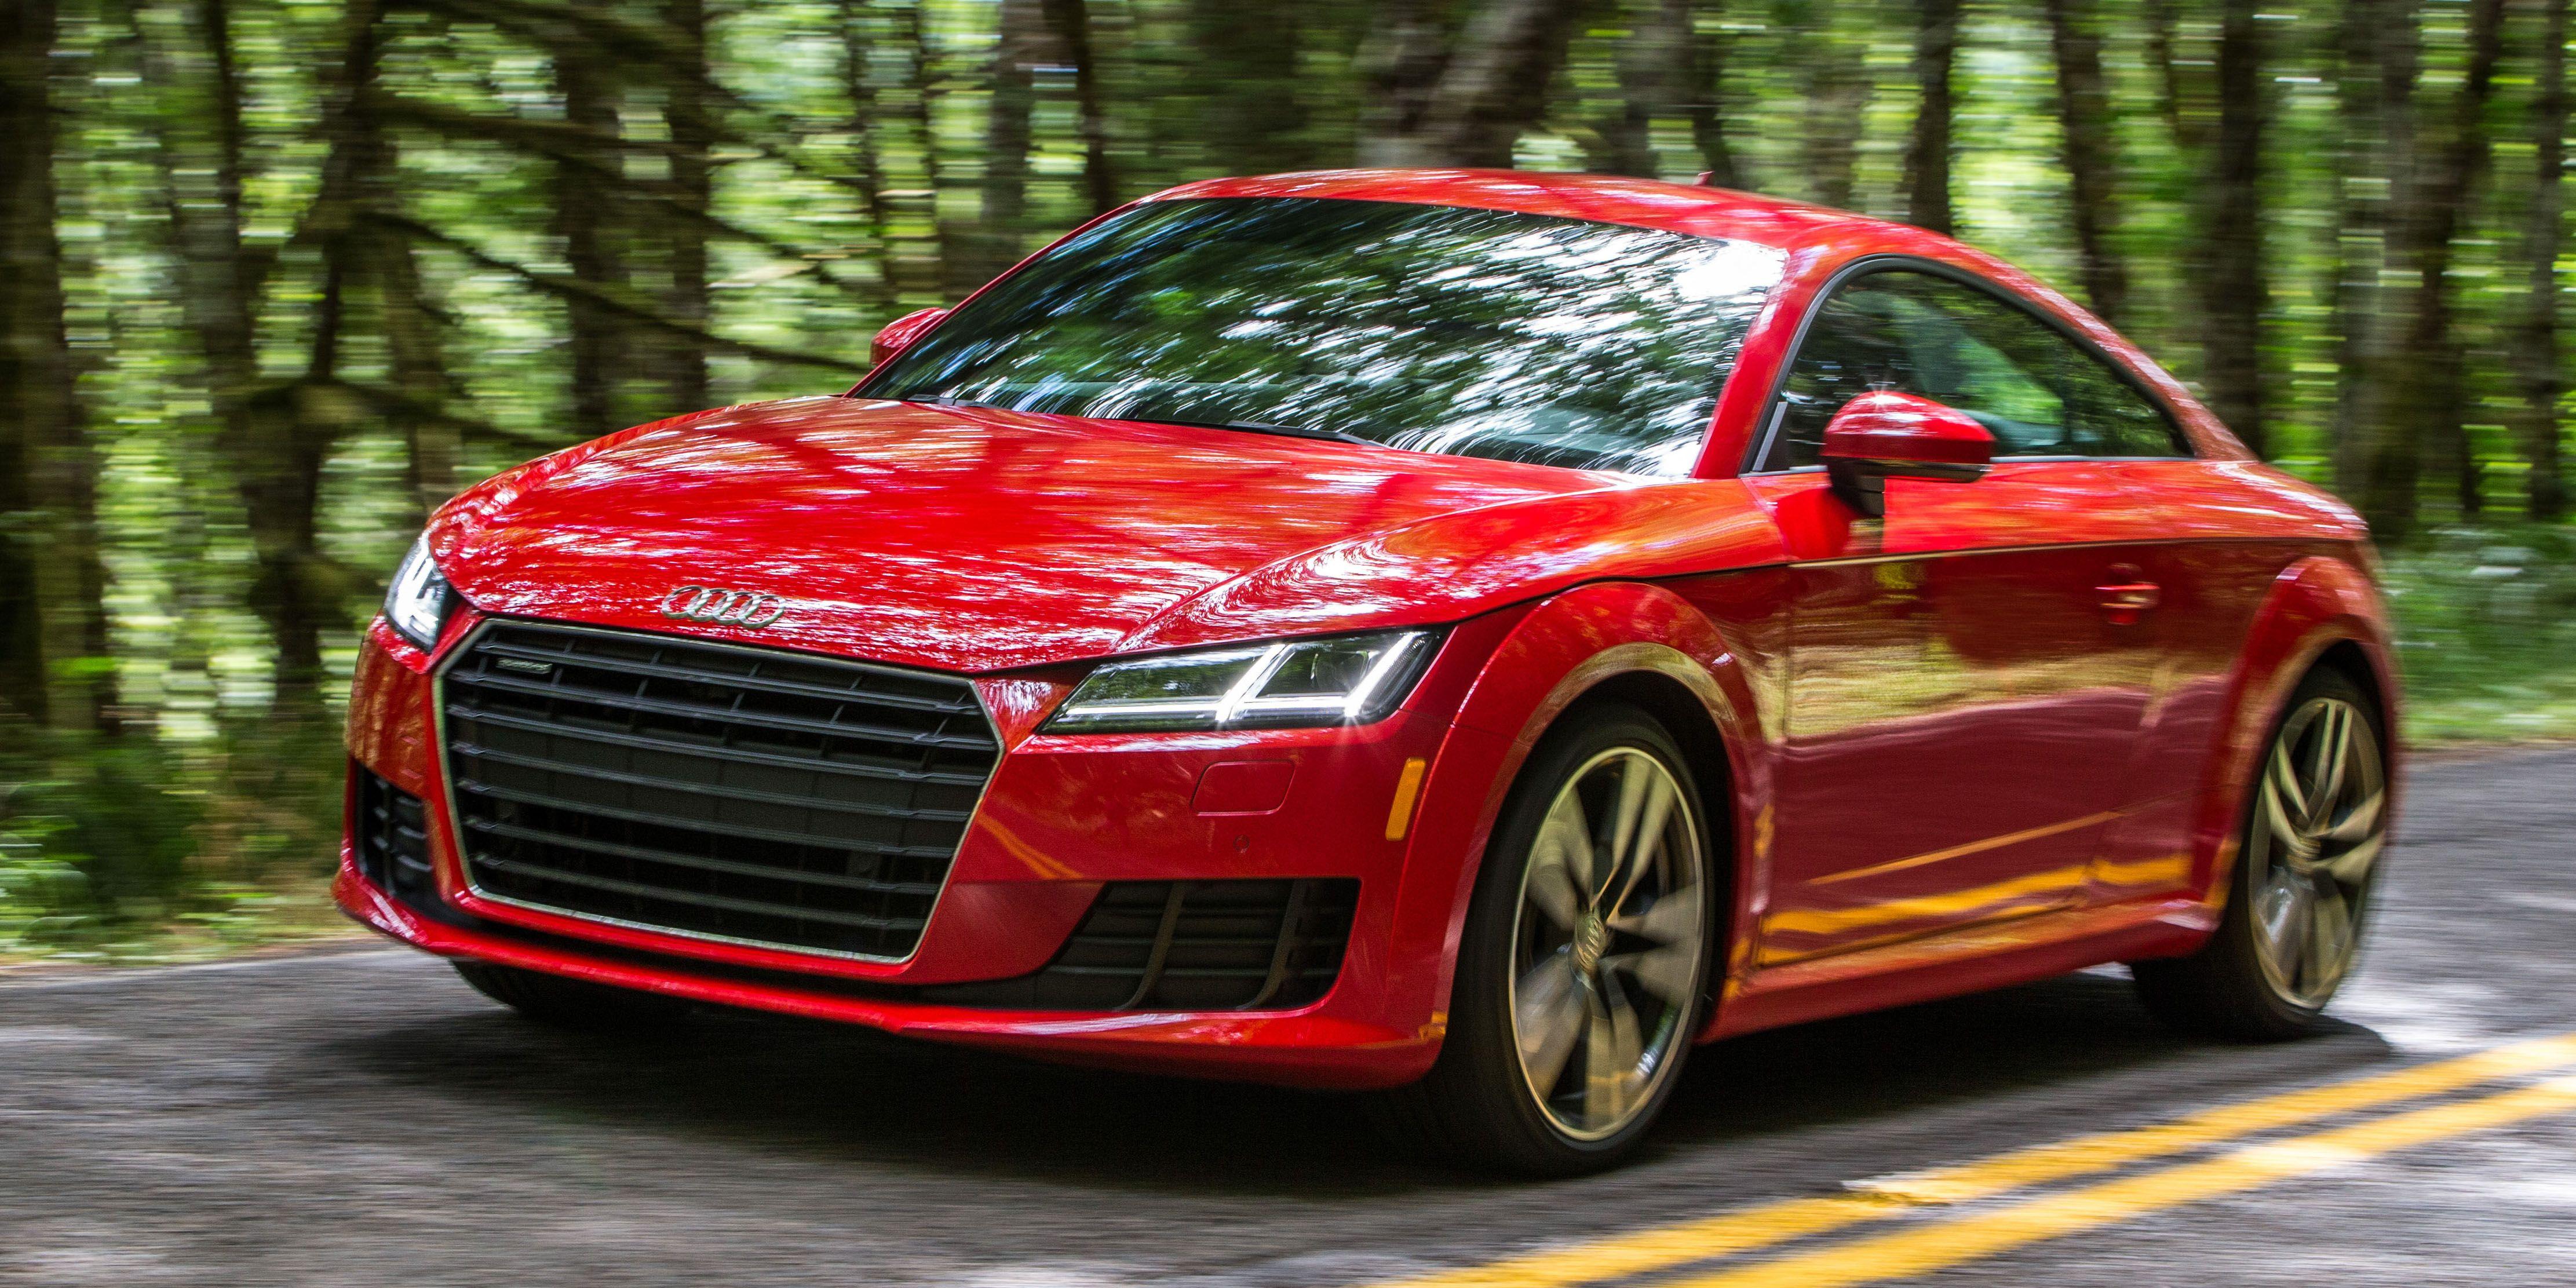 The 2016 Audi Tt Is Closer Than Ever To A True Sportscar